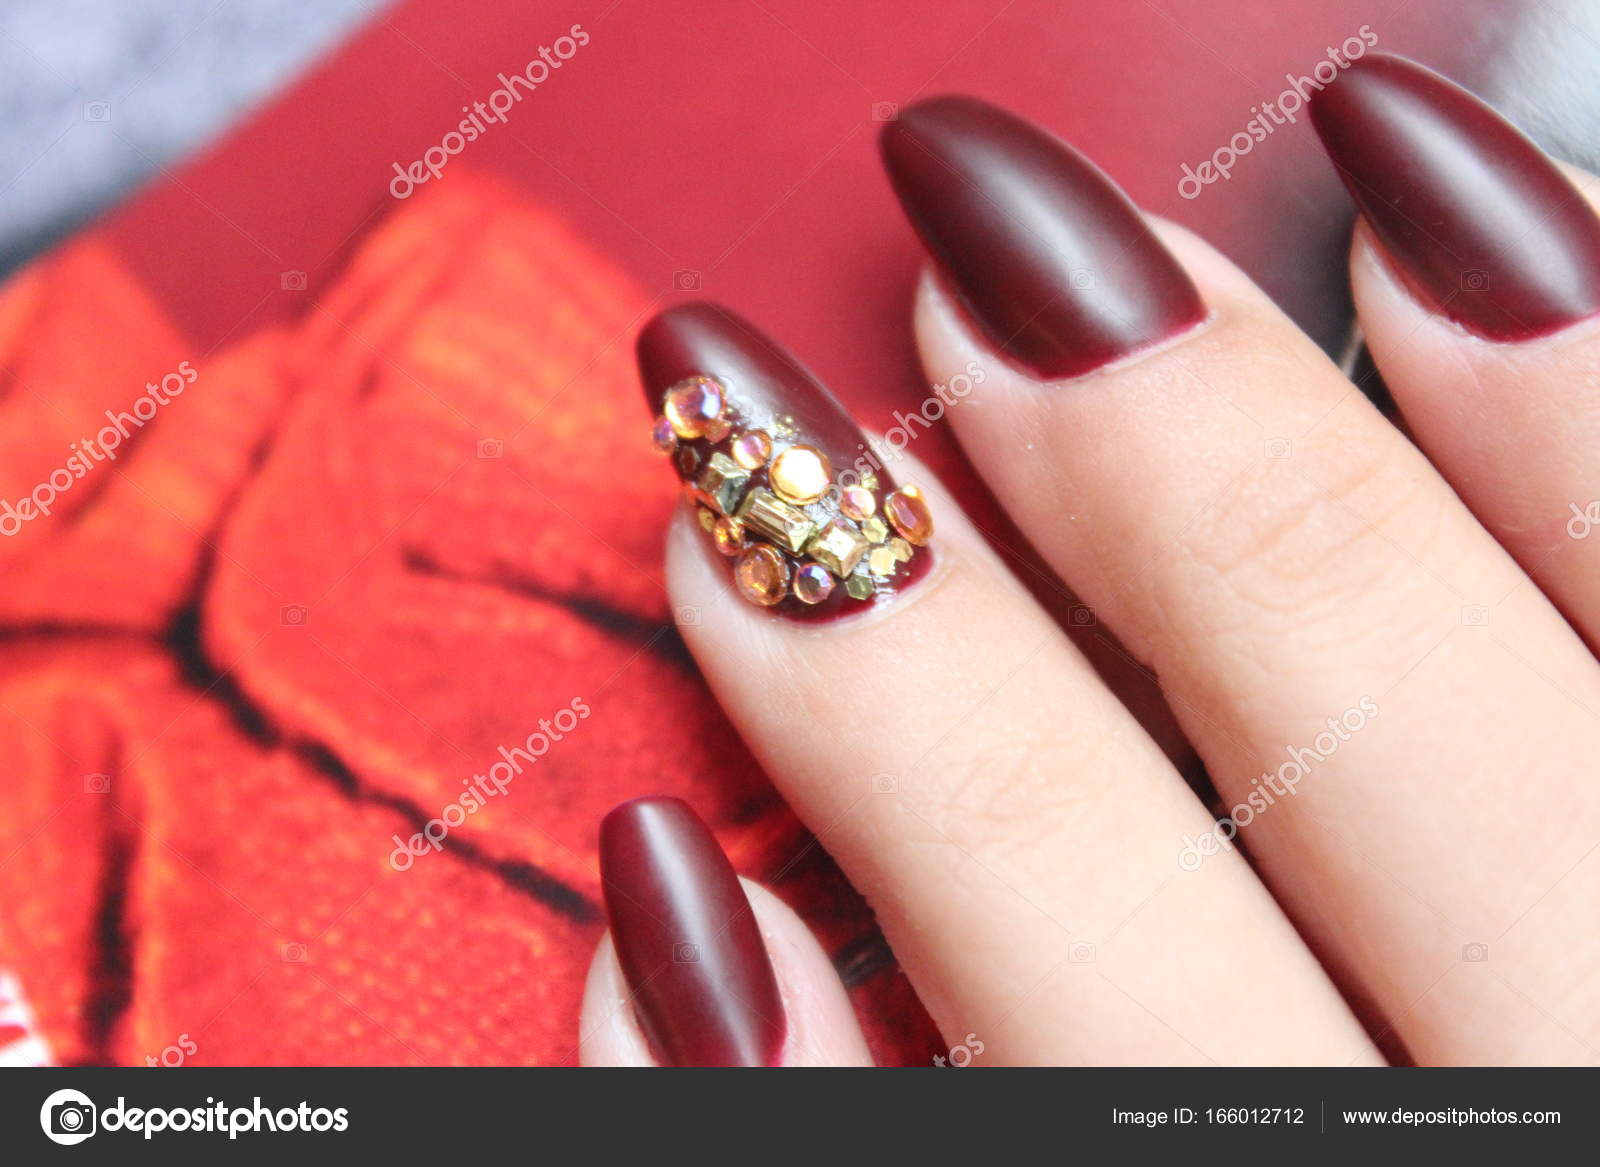 red nailart jewel nails — Stock Photo © Patwind #166012712